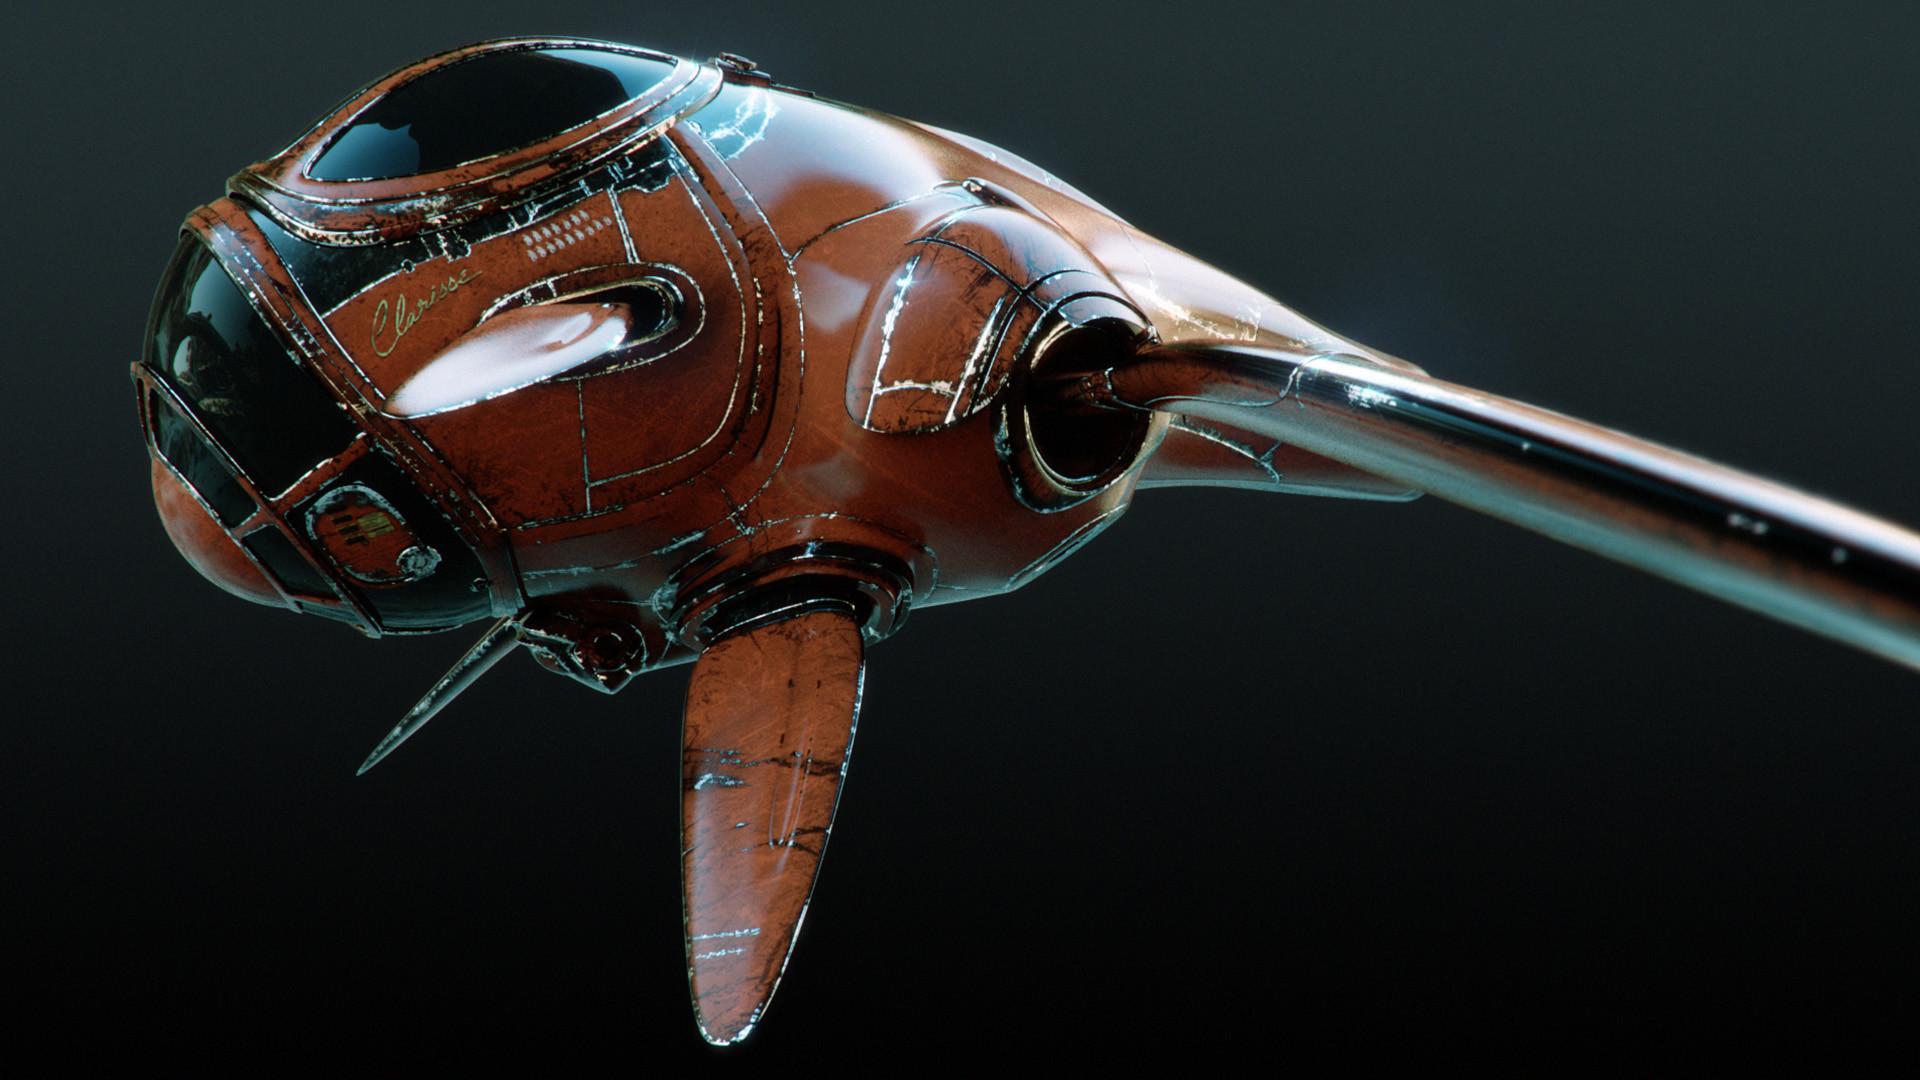 Clarisse render of the spaceship. Legacy shaders.